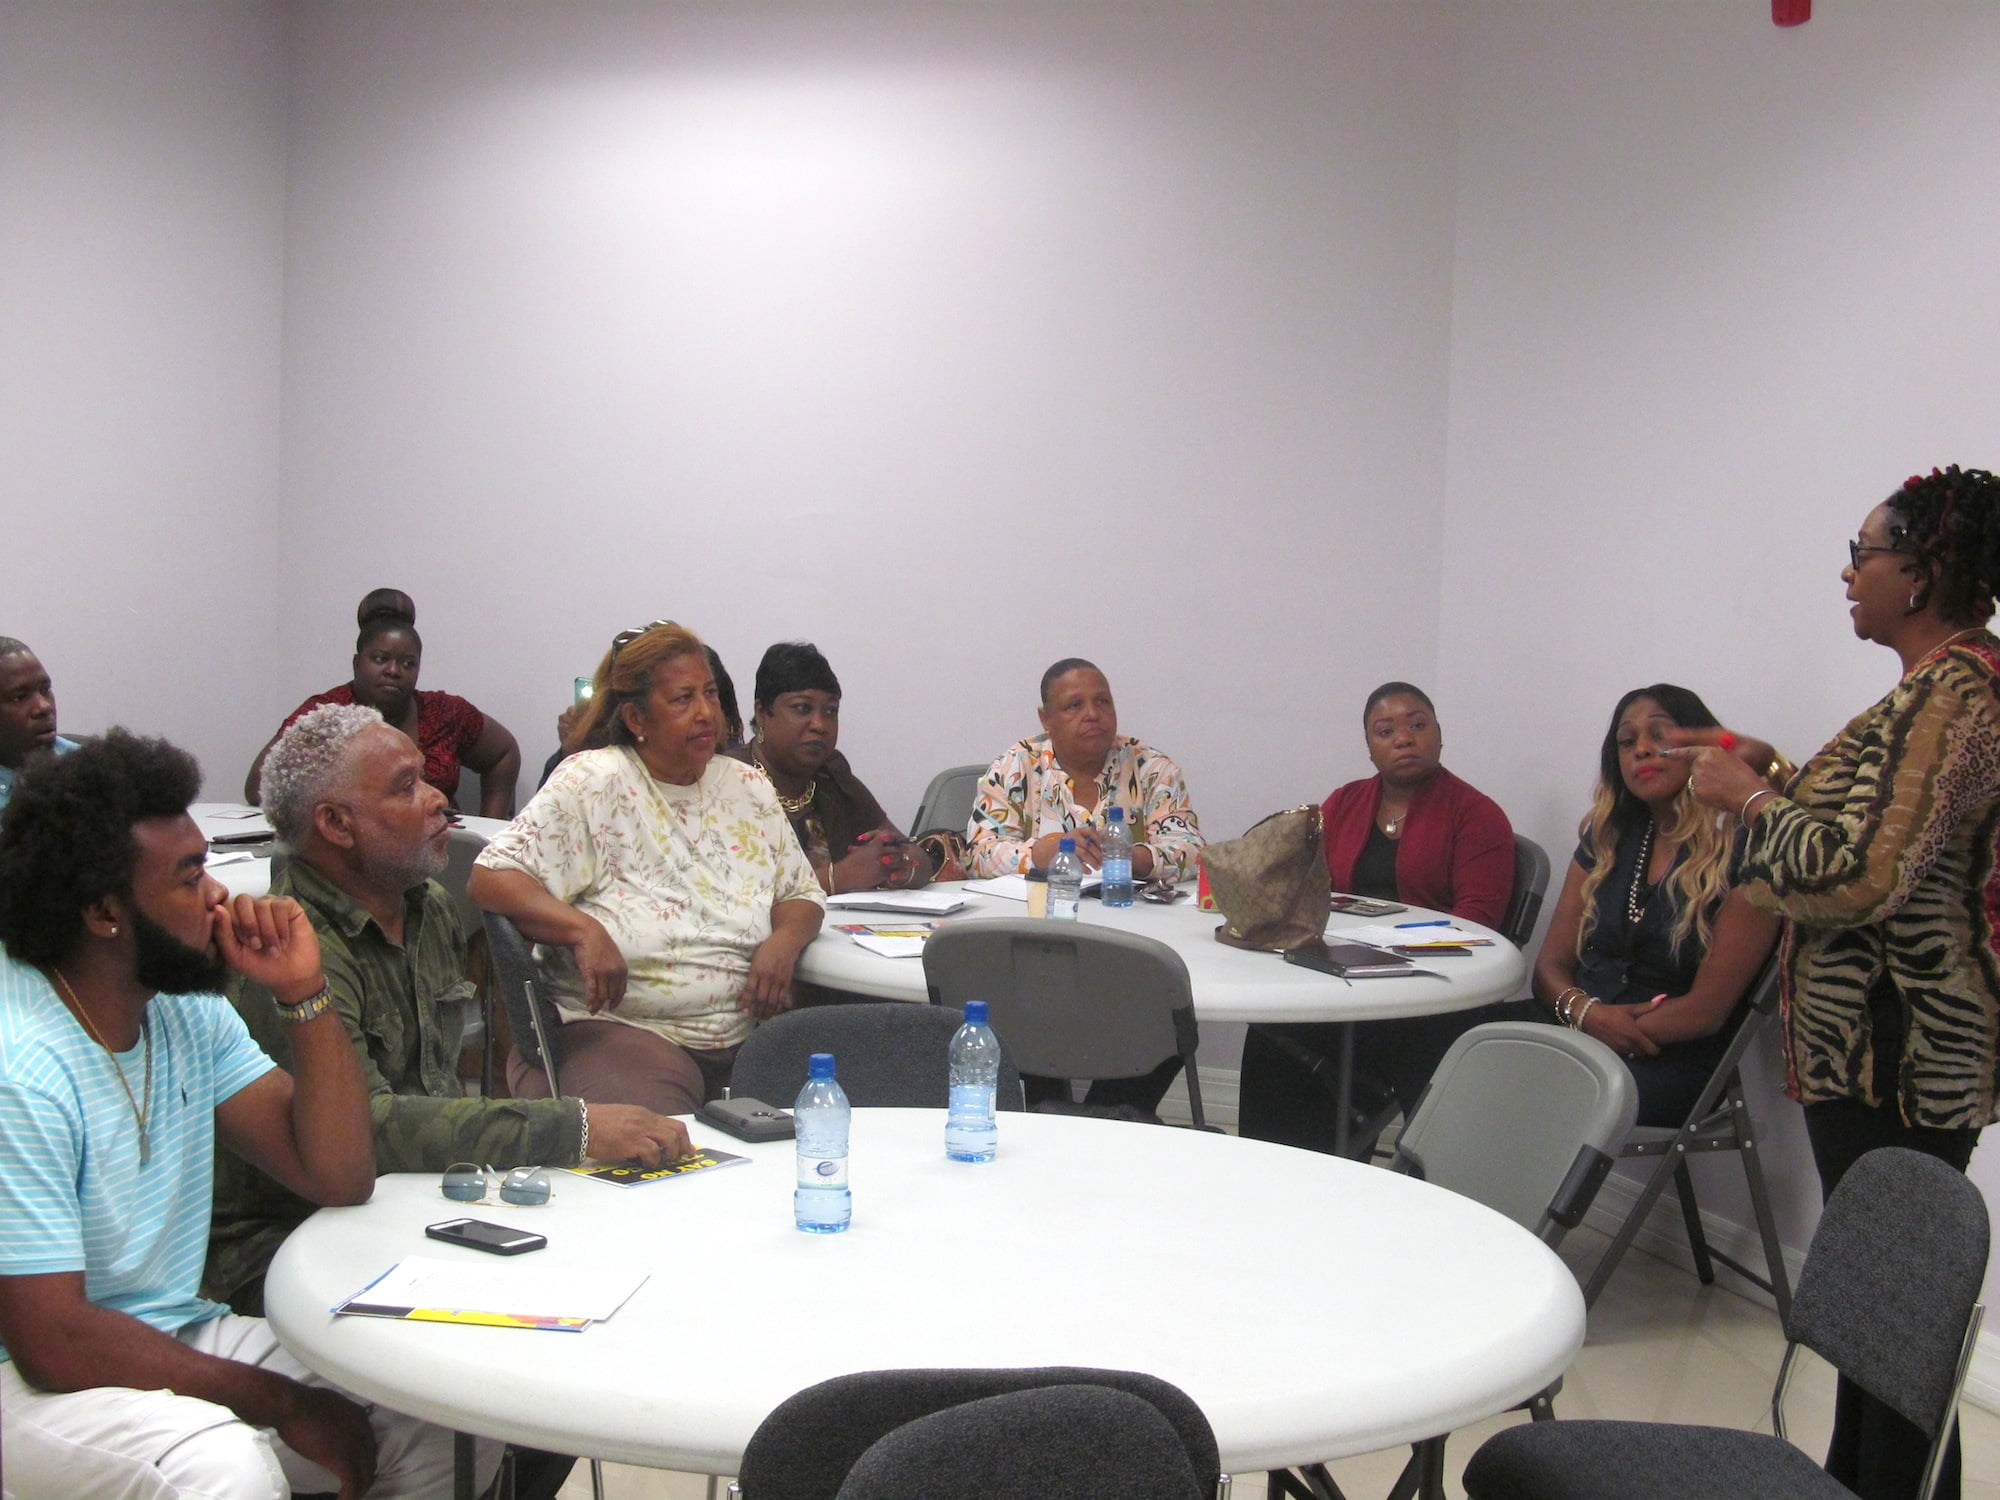 Workshop to help facilitate 'even more effective' community drug intervention programmes